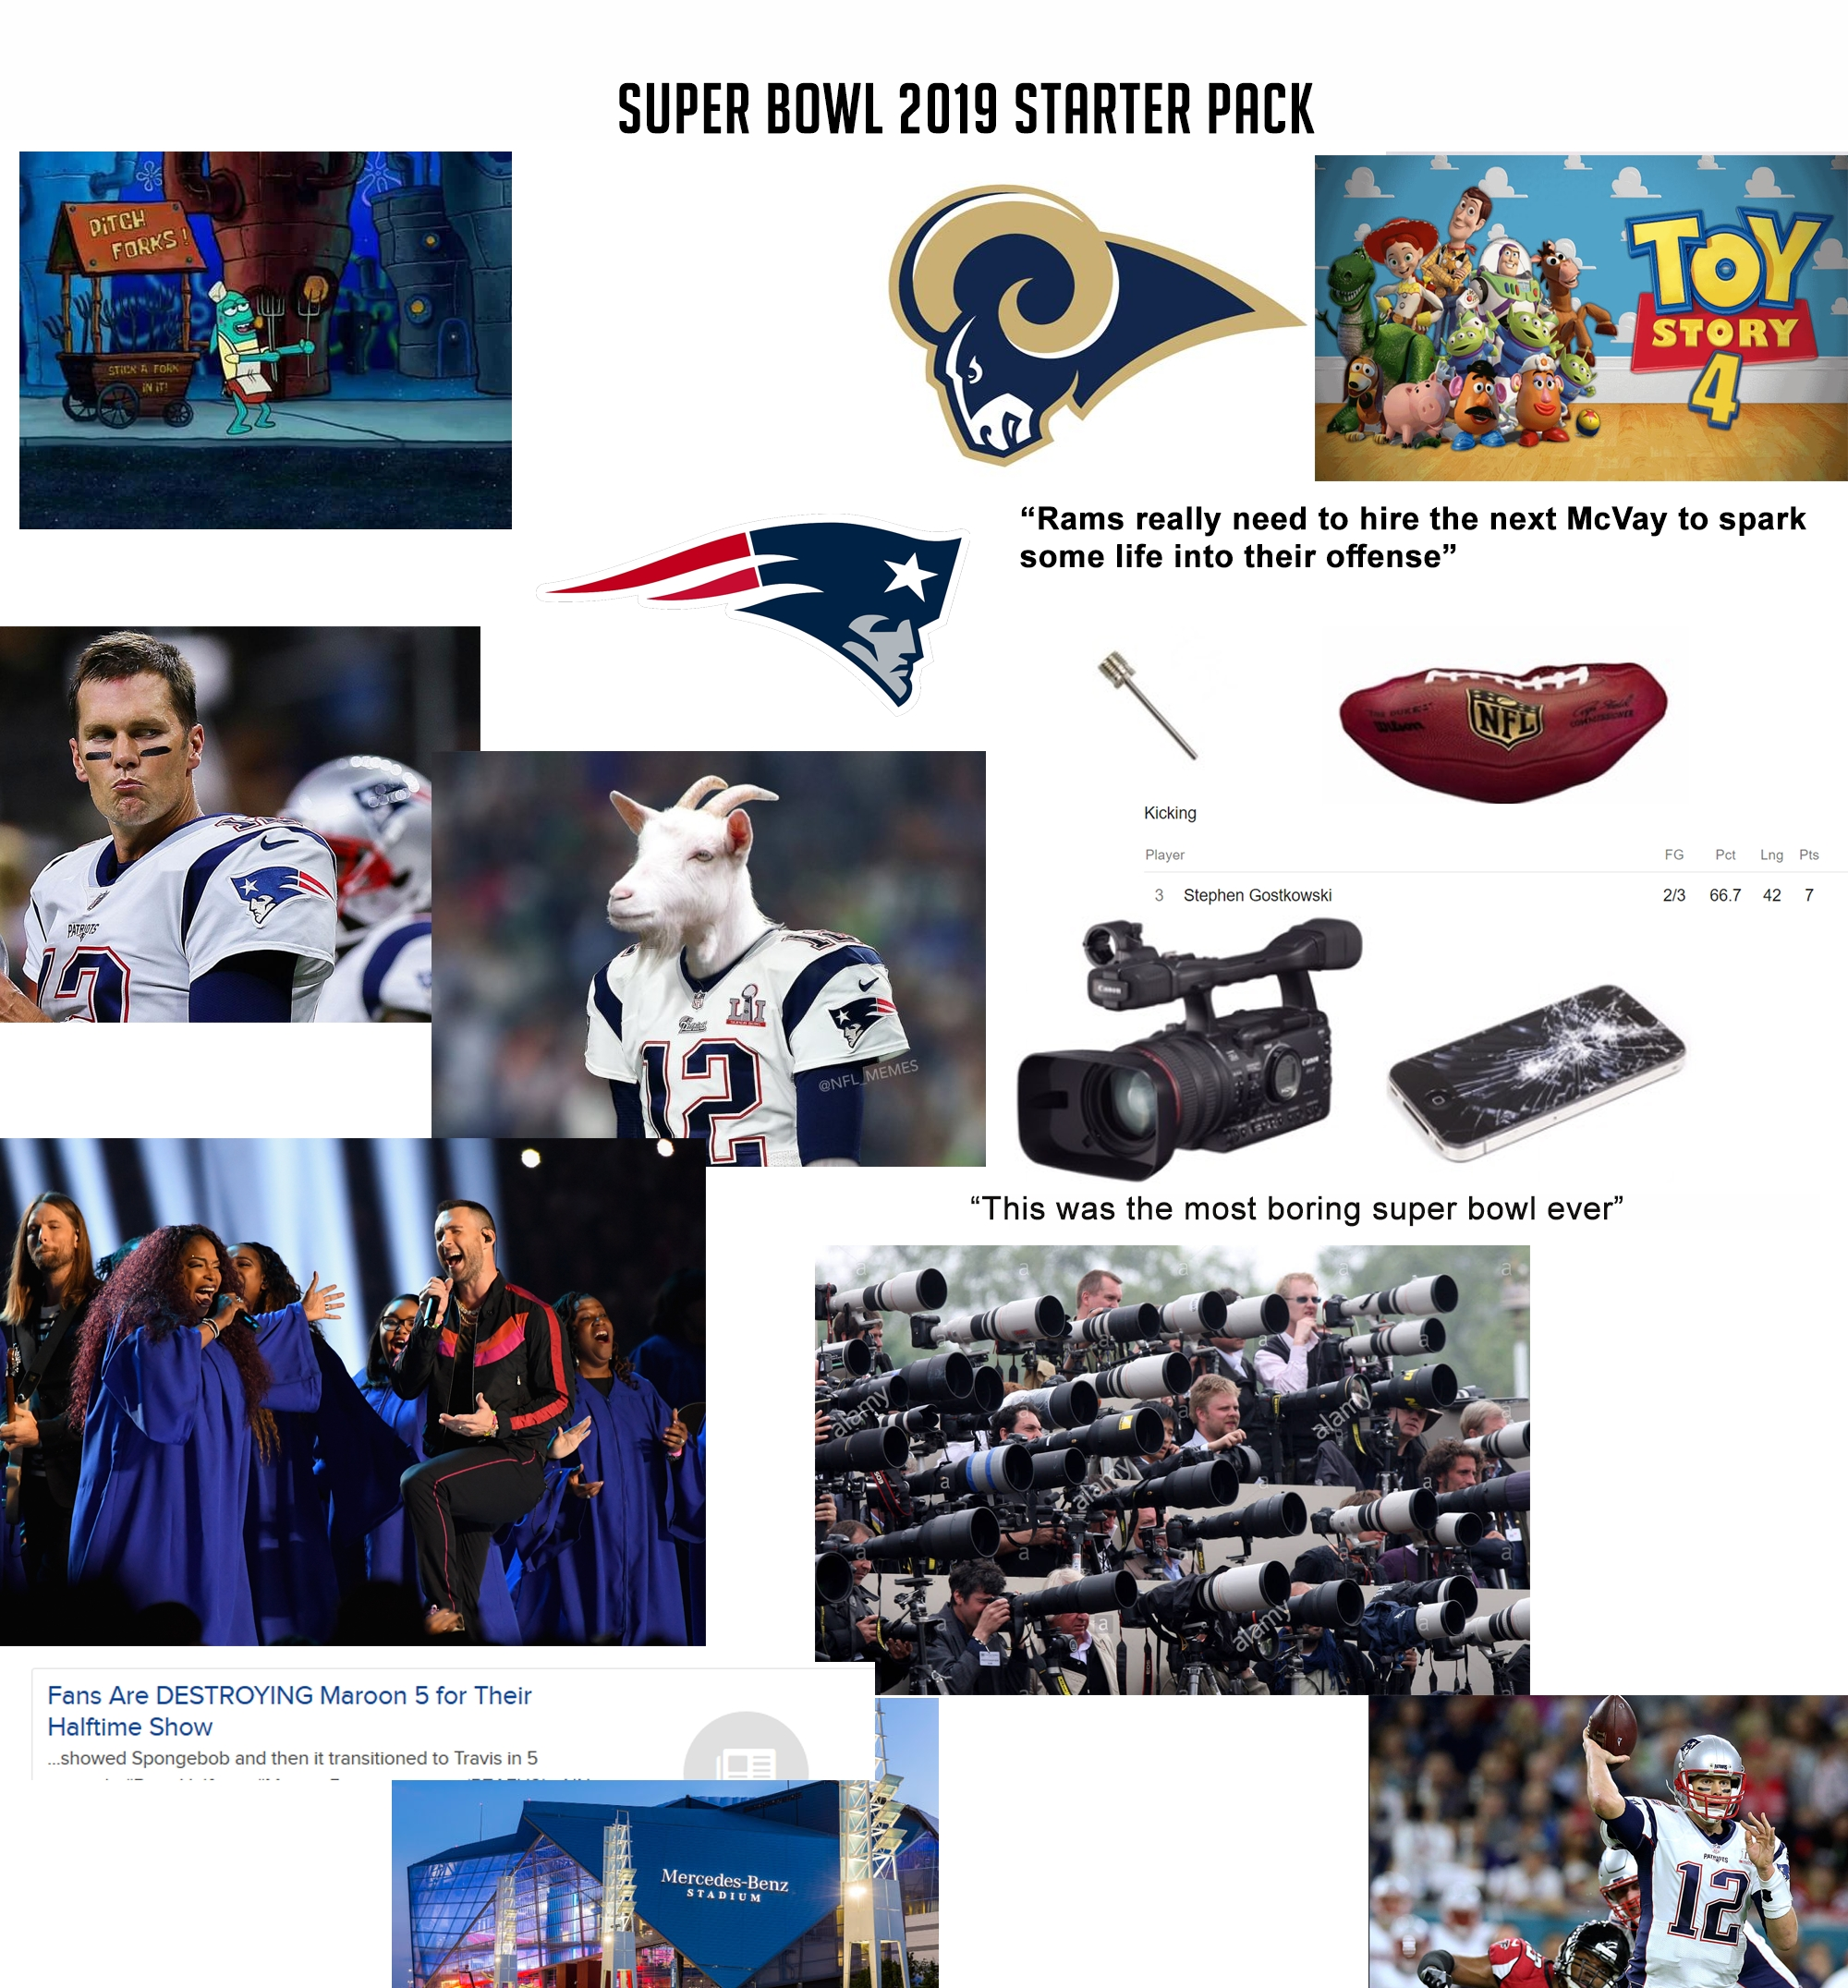 The Super Bowl 2019 Starter Pack : Starterpacks for Super Bowl 2019 Reddit